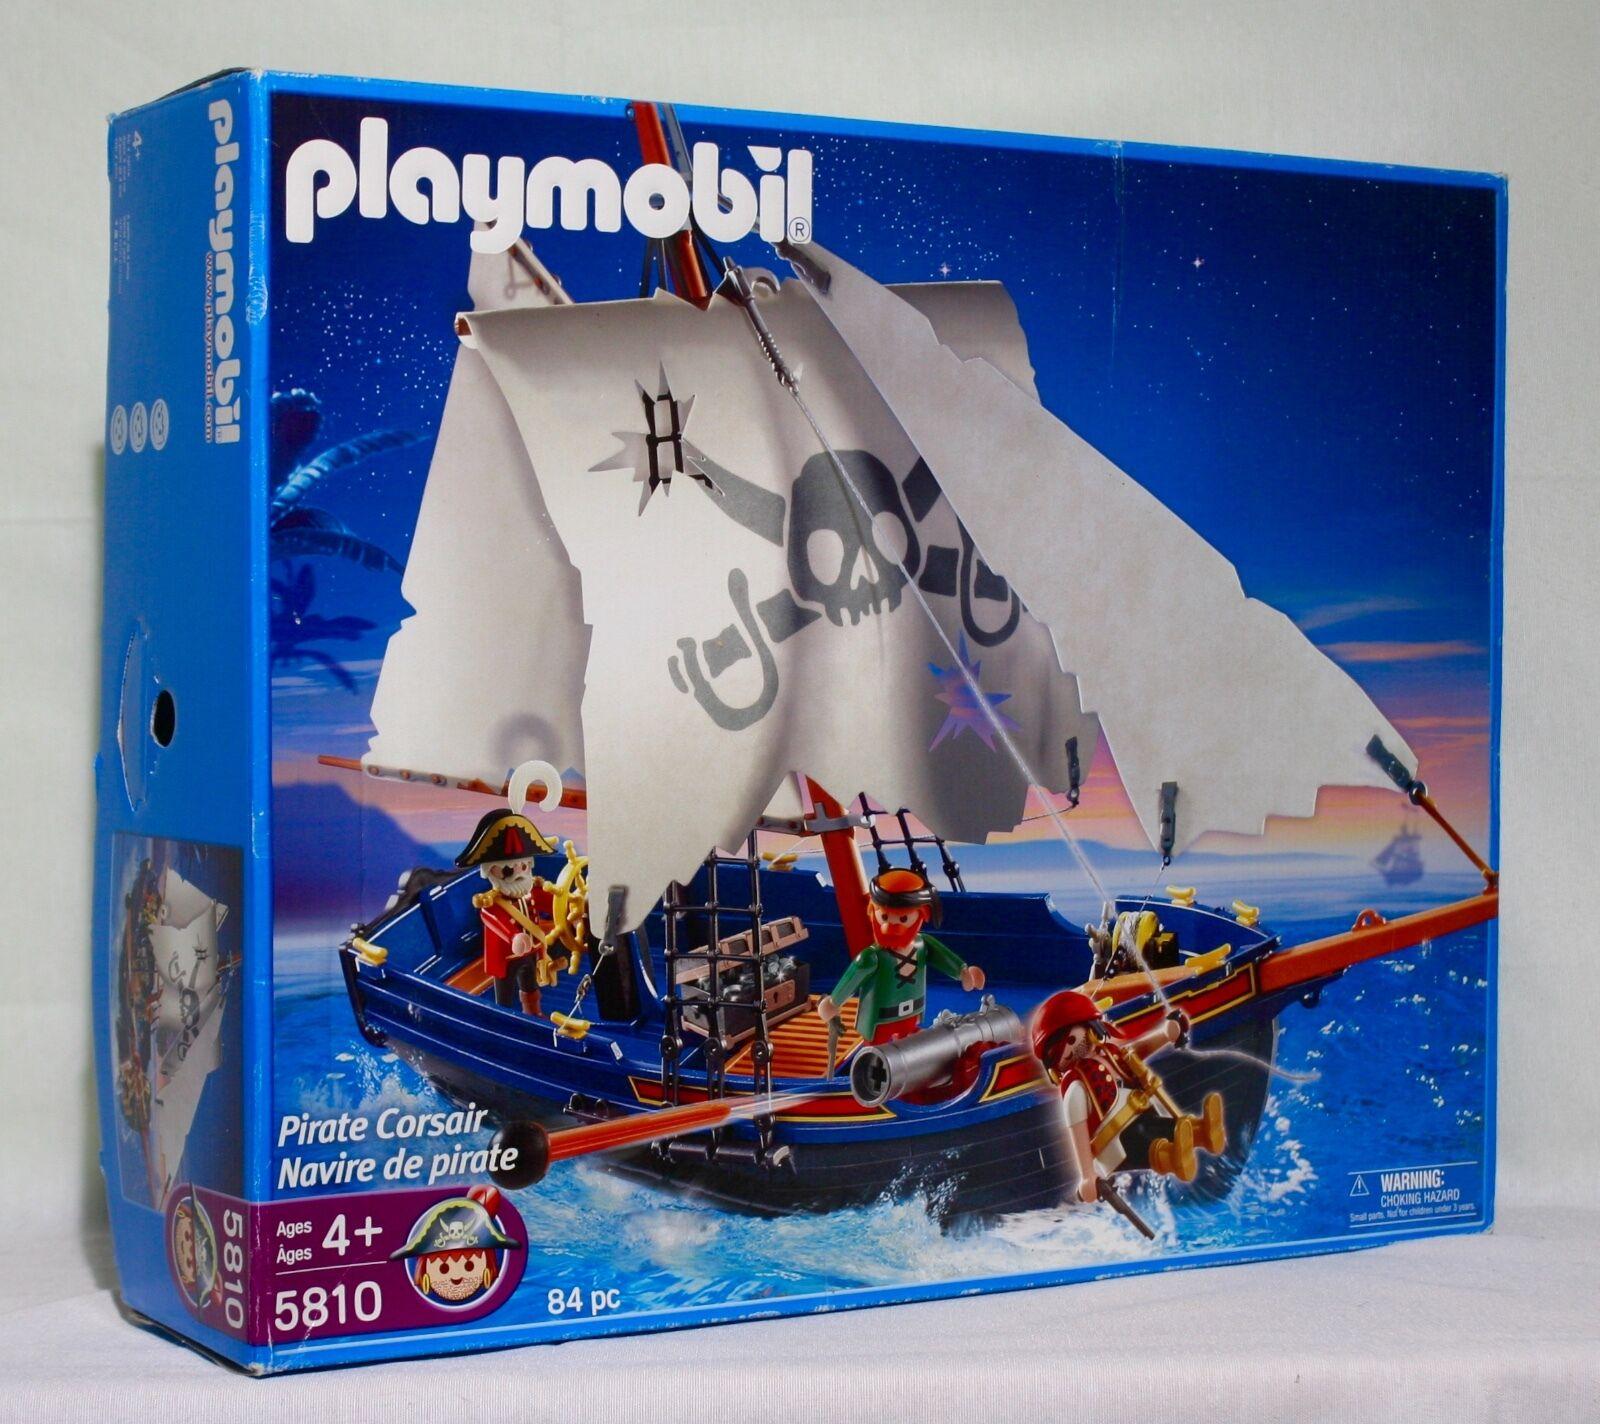 prendi l'ultimo RETIrosso Playmobil Playmobil Playmobil PIRATE CORSAIR SHIP 5810  NIB sealed  80% di sconto